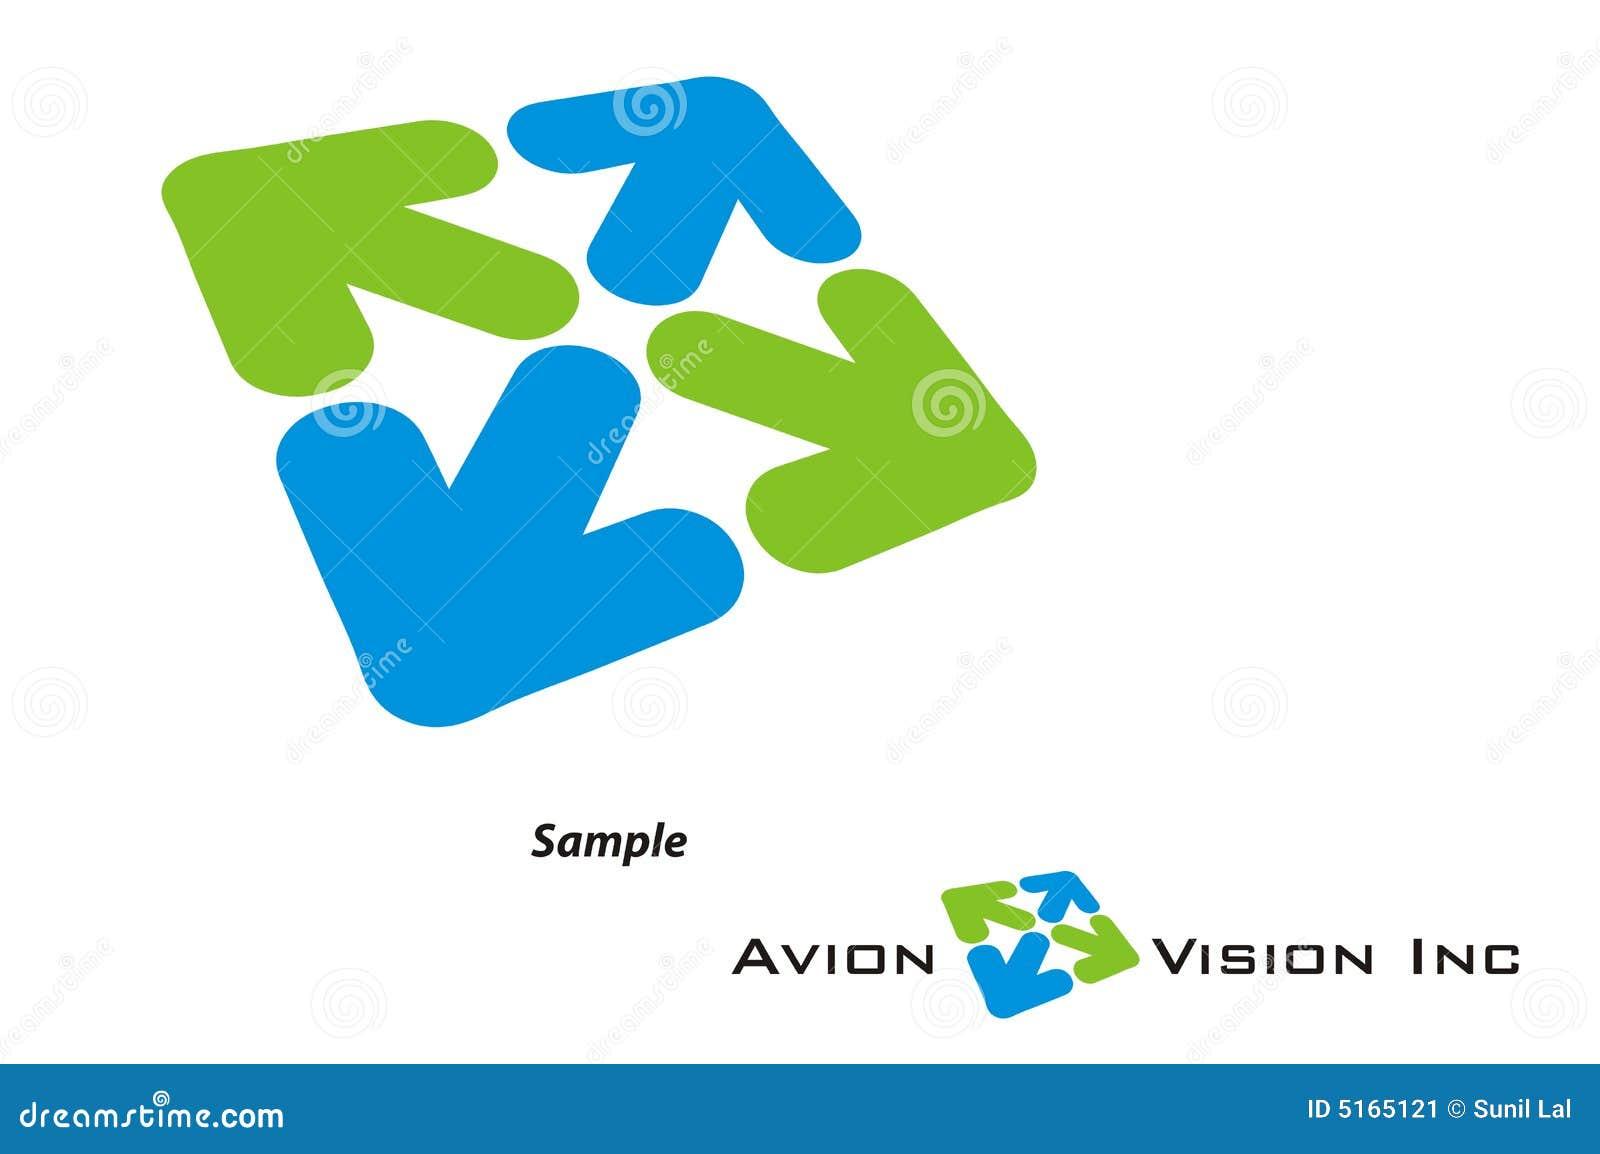 logo coursetourismecompagnie davaition illustration